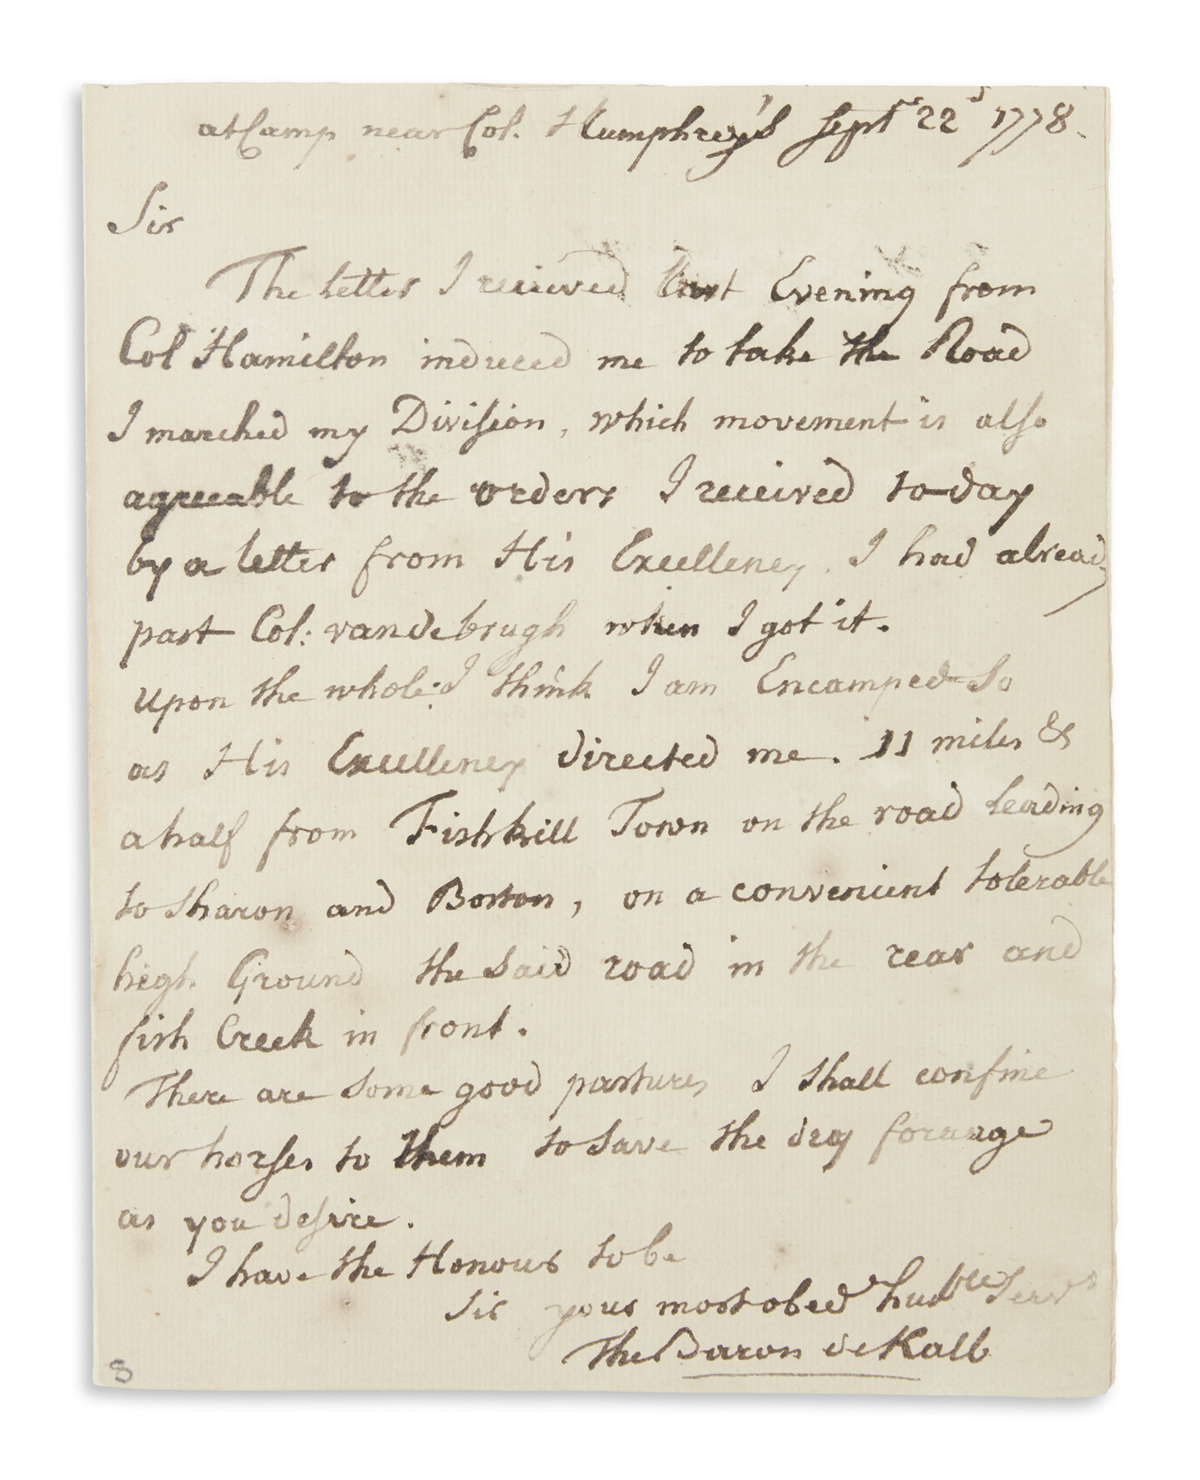 KALB, JOHANN. Autograph Letter Signed, The Baron deKalb, to Colonel Charles Pettit,